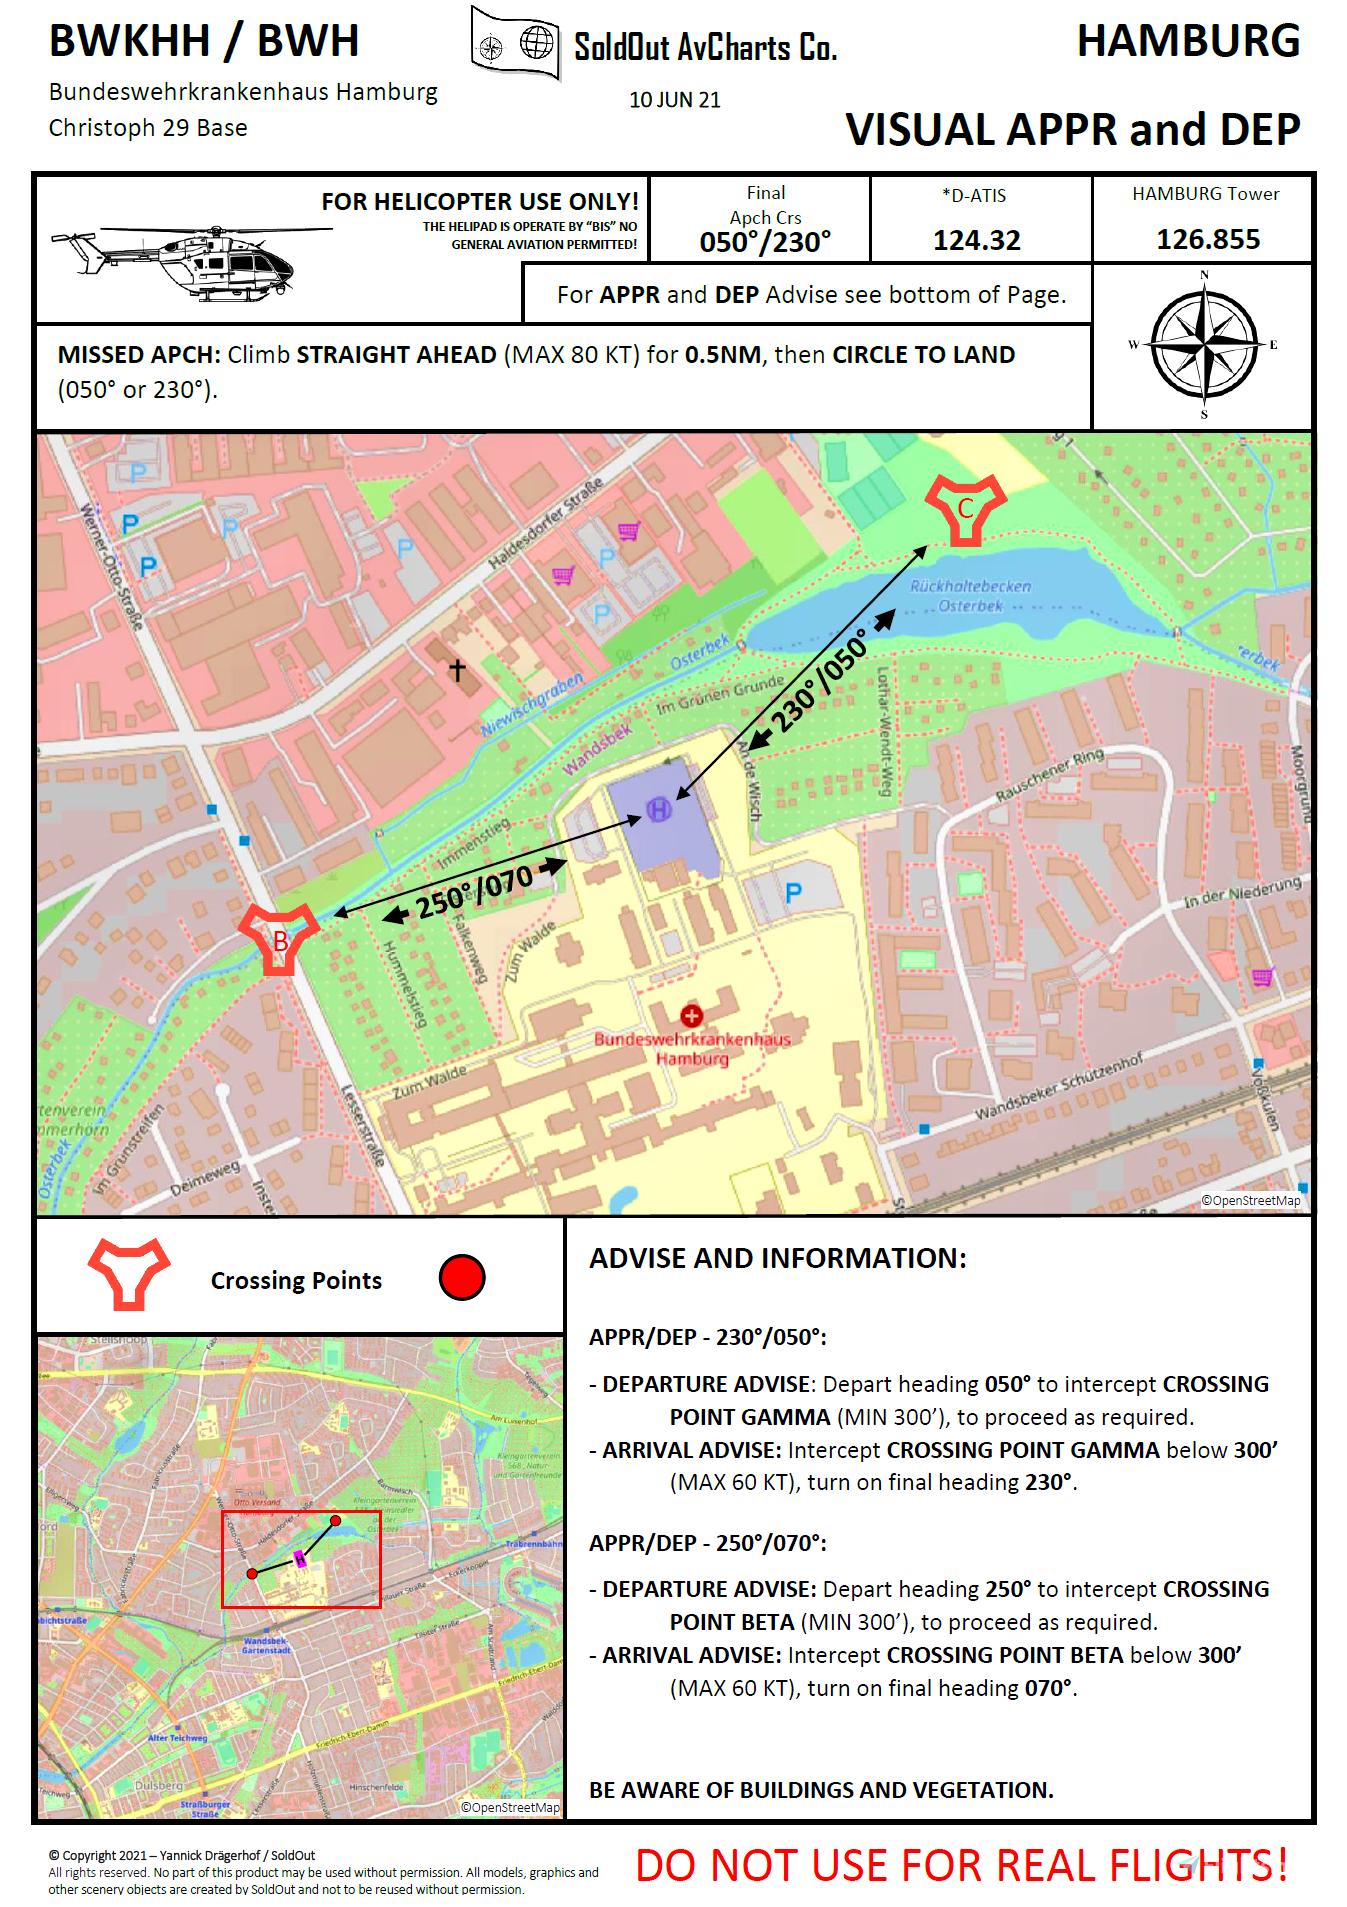 12 Hamburg Air Rescue Helipads + Charts for 2 Helipads!